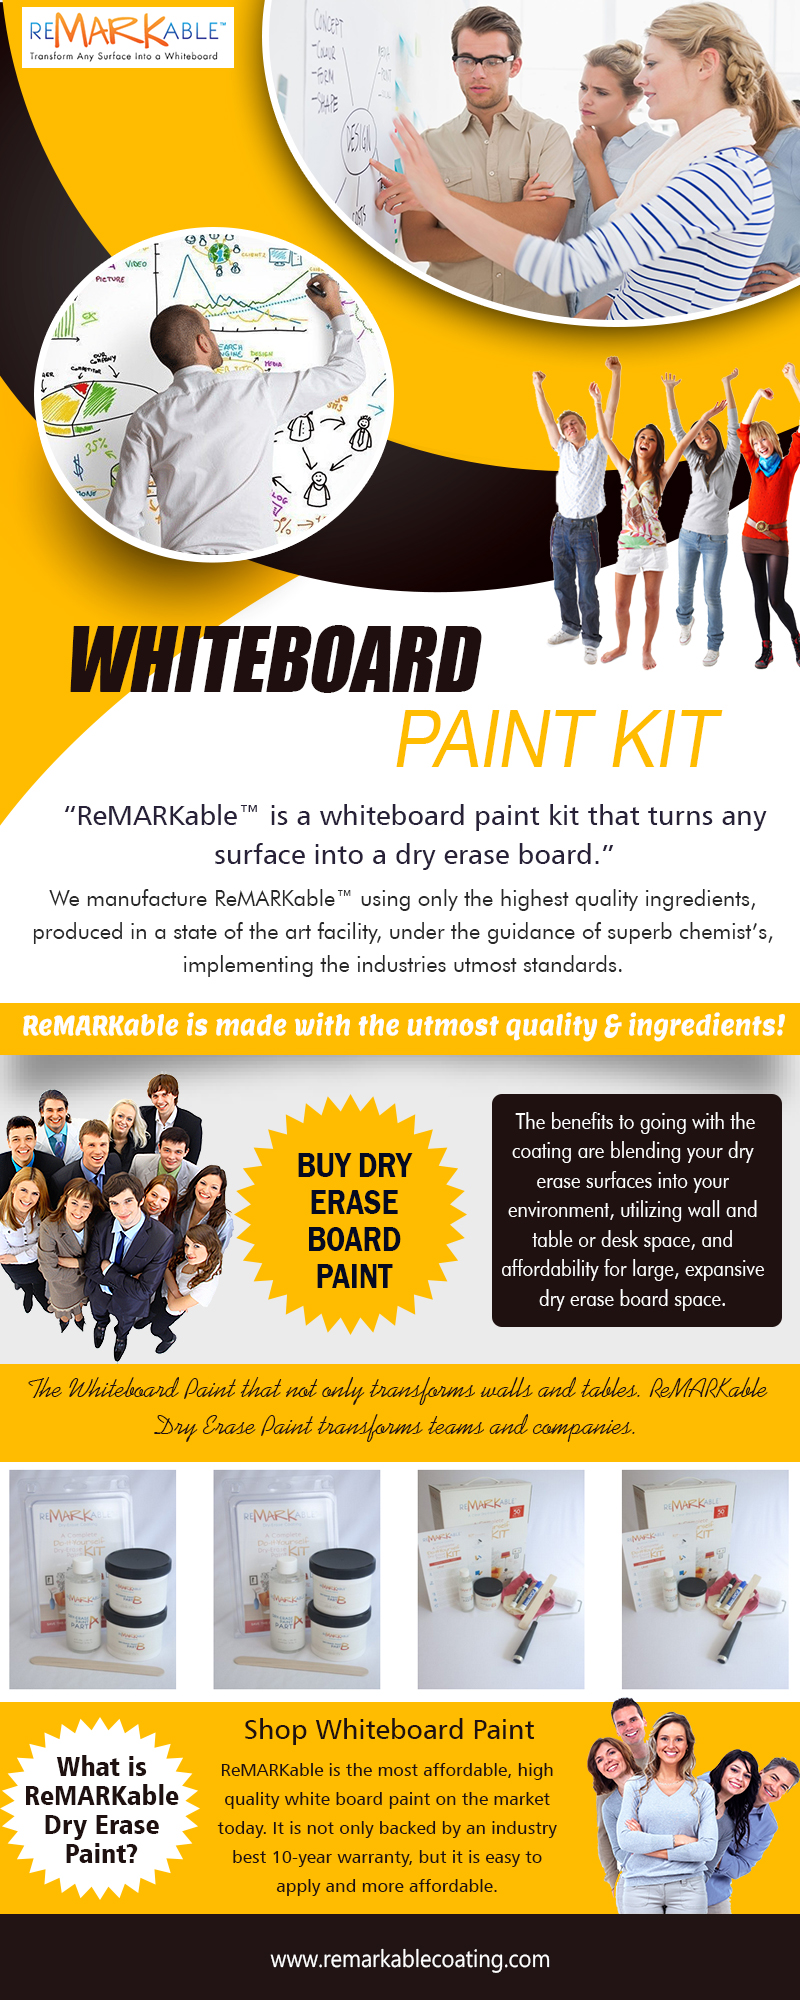 Whiteboard Paint Kit